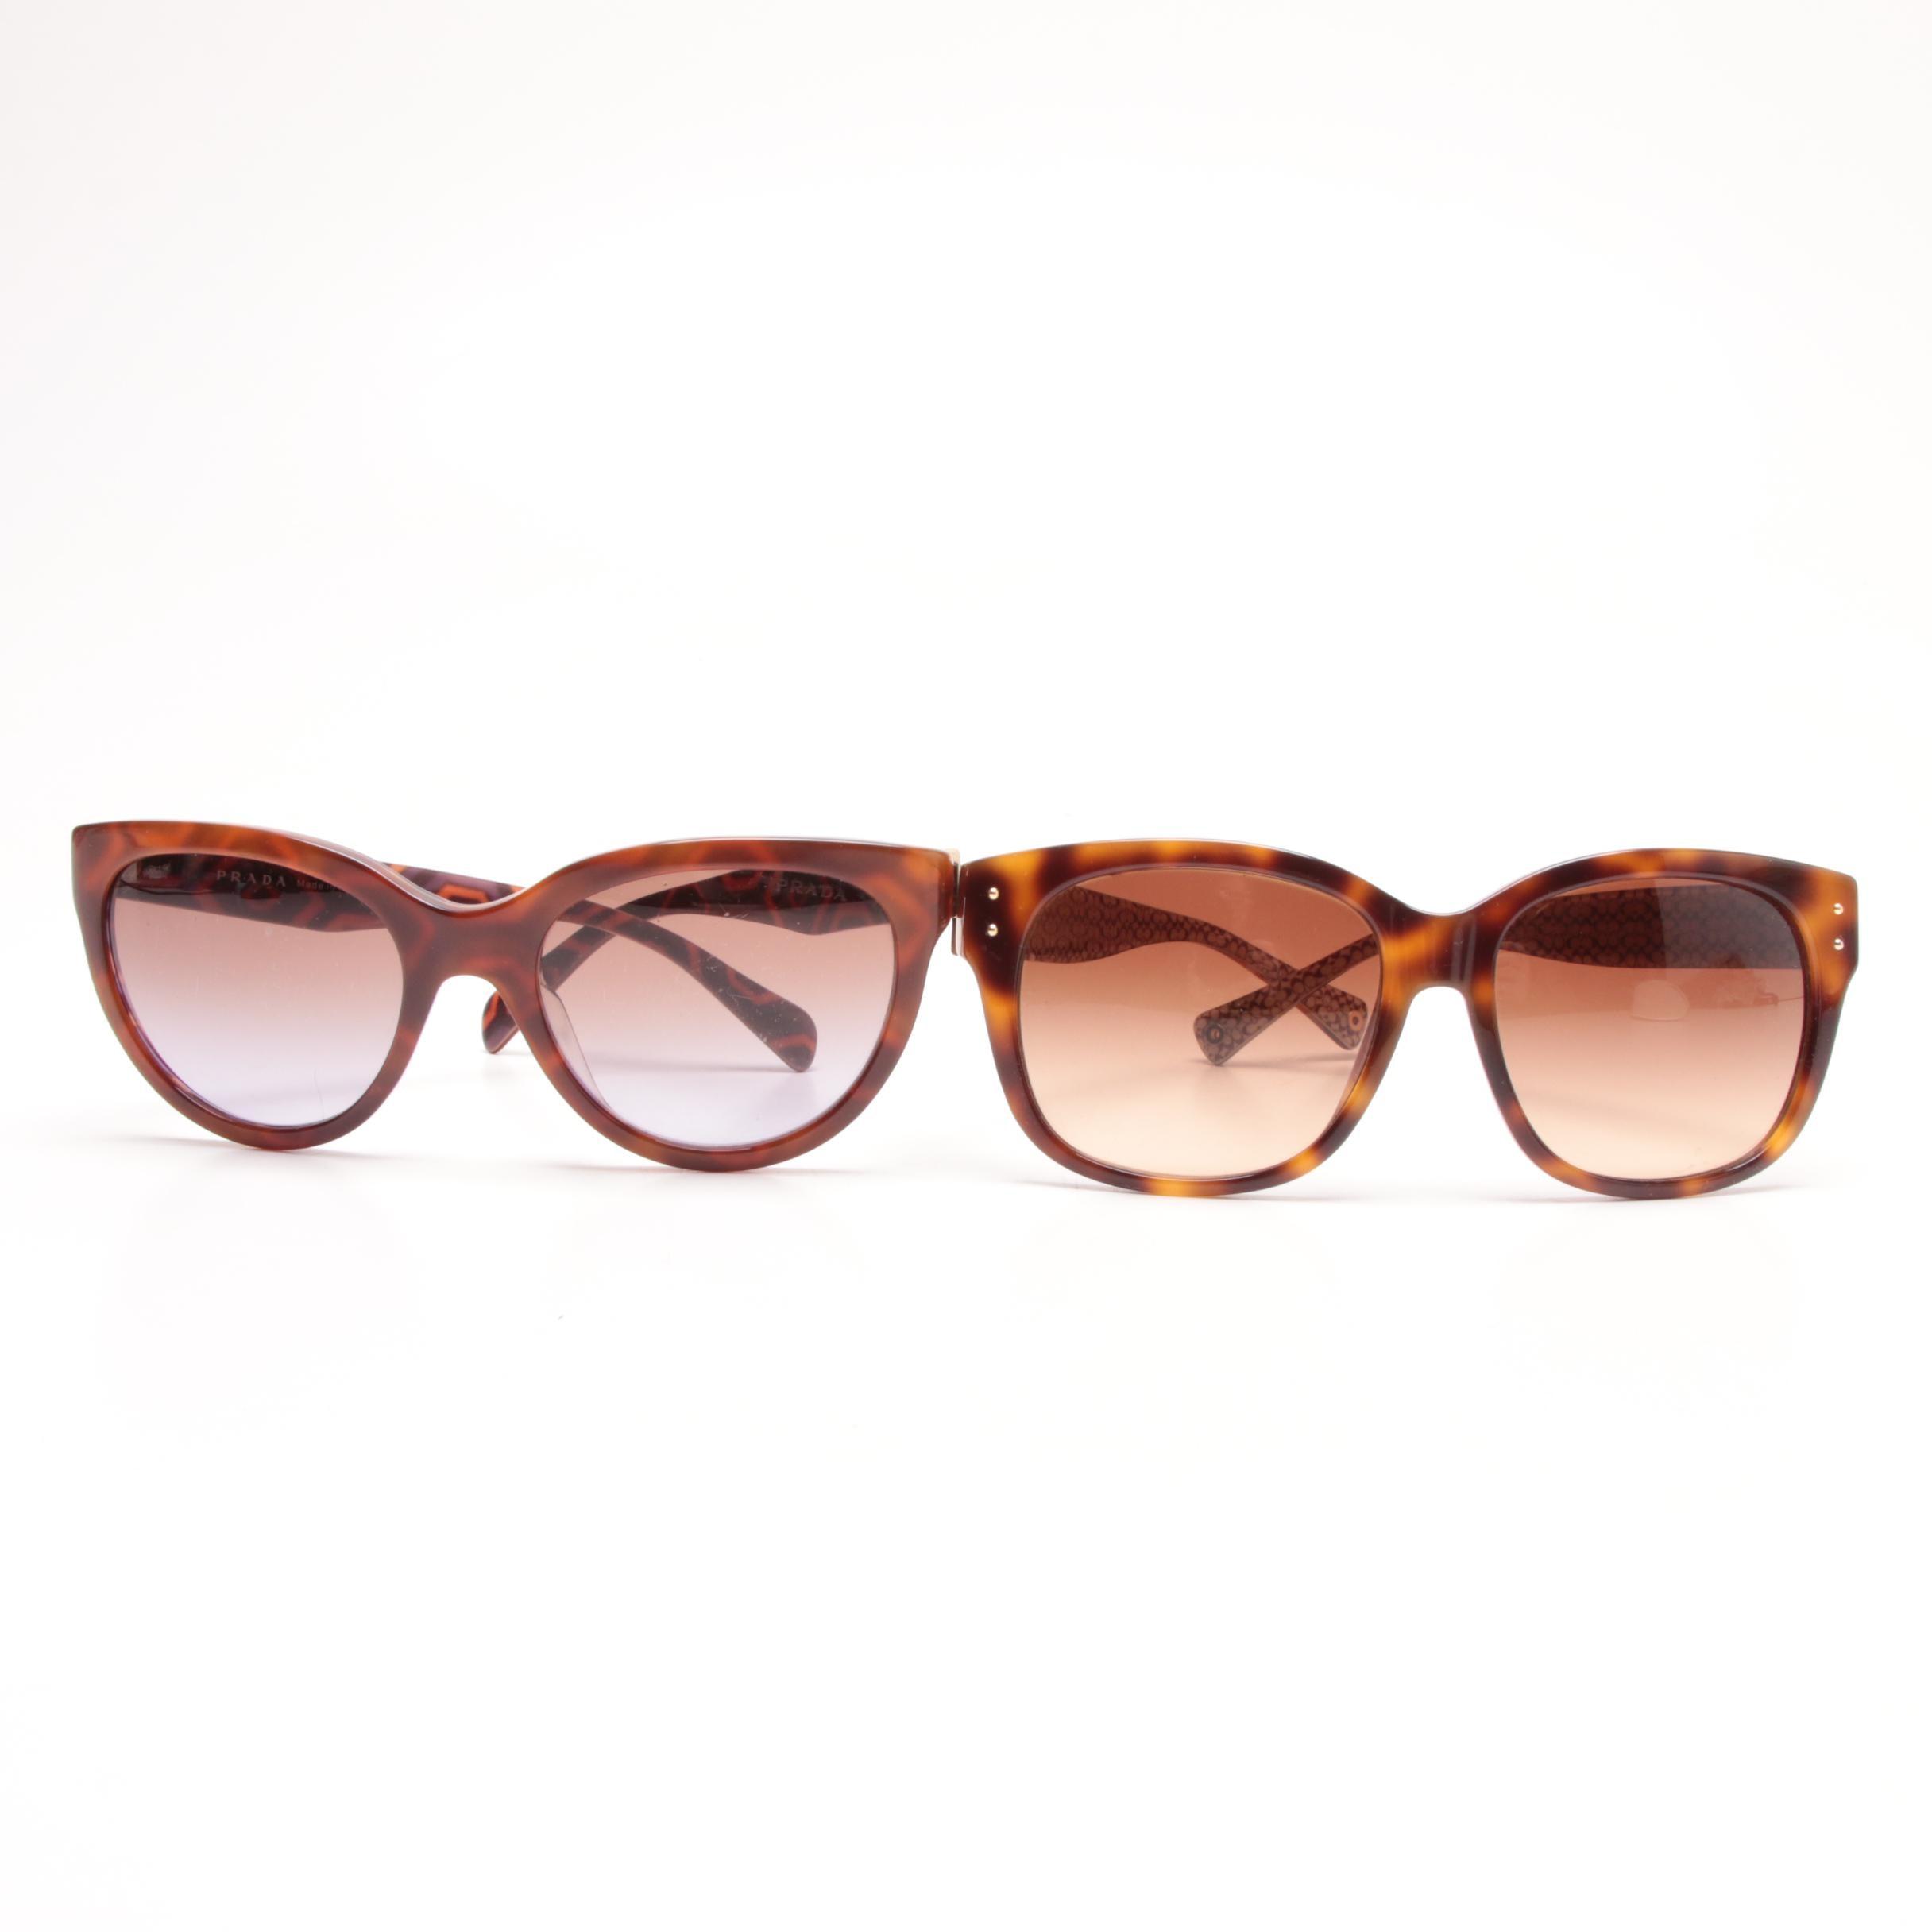 Prada and Coach Sienna Tortoiseshell Style Sunglasses with Cases